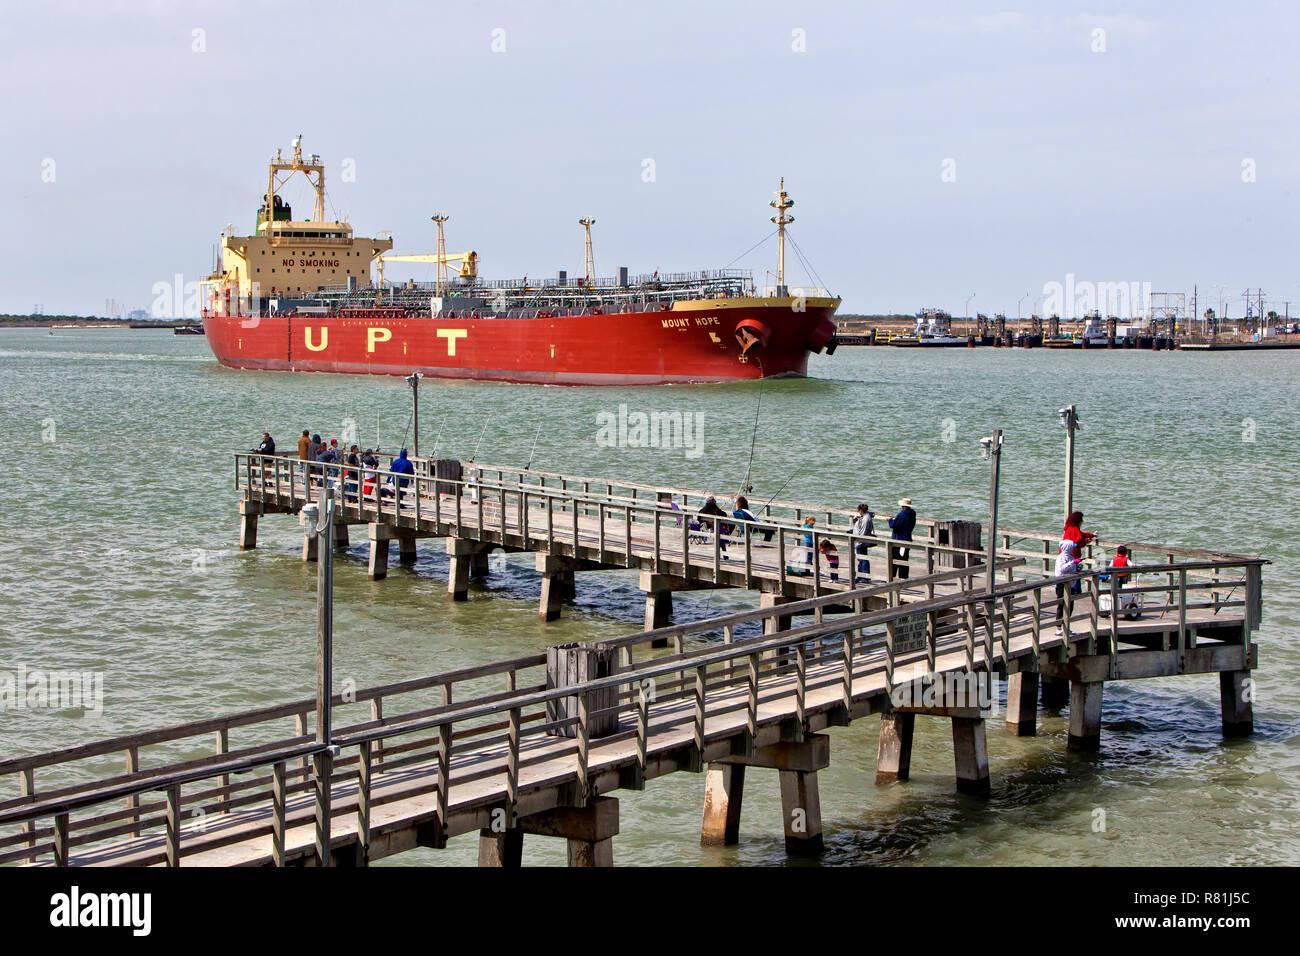 Liquid Bulk Tanker 'Mount Hope', UPT maneuvering Corpus Christi Shipping Channel, passing Roberts Point Park, Port Aransas. Stock Photo